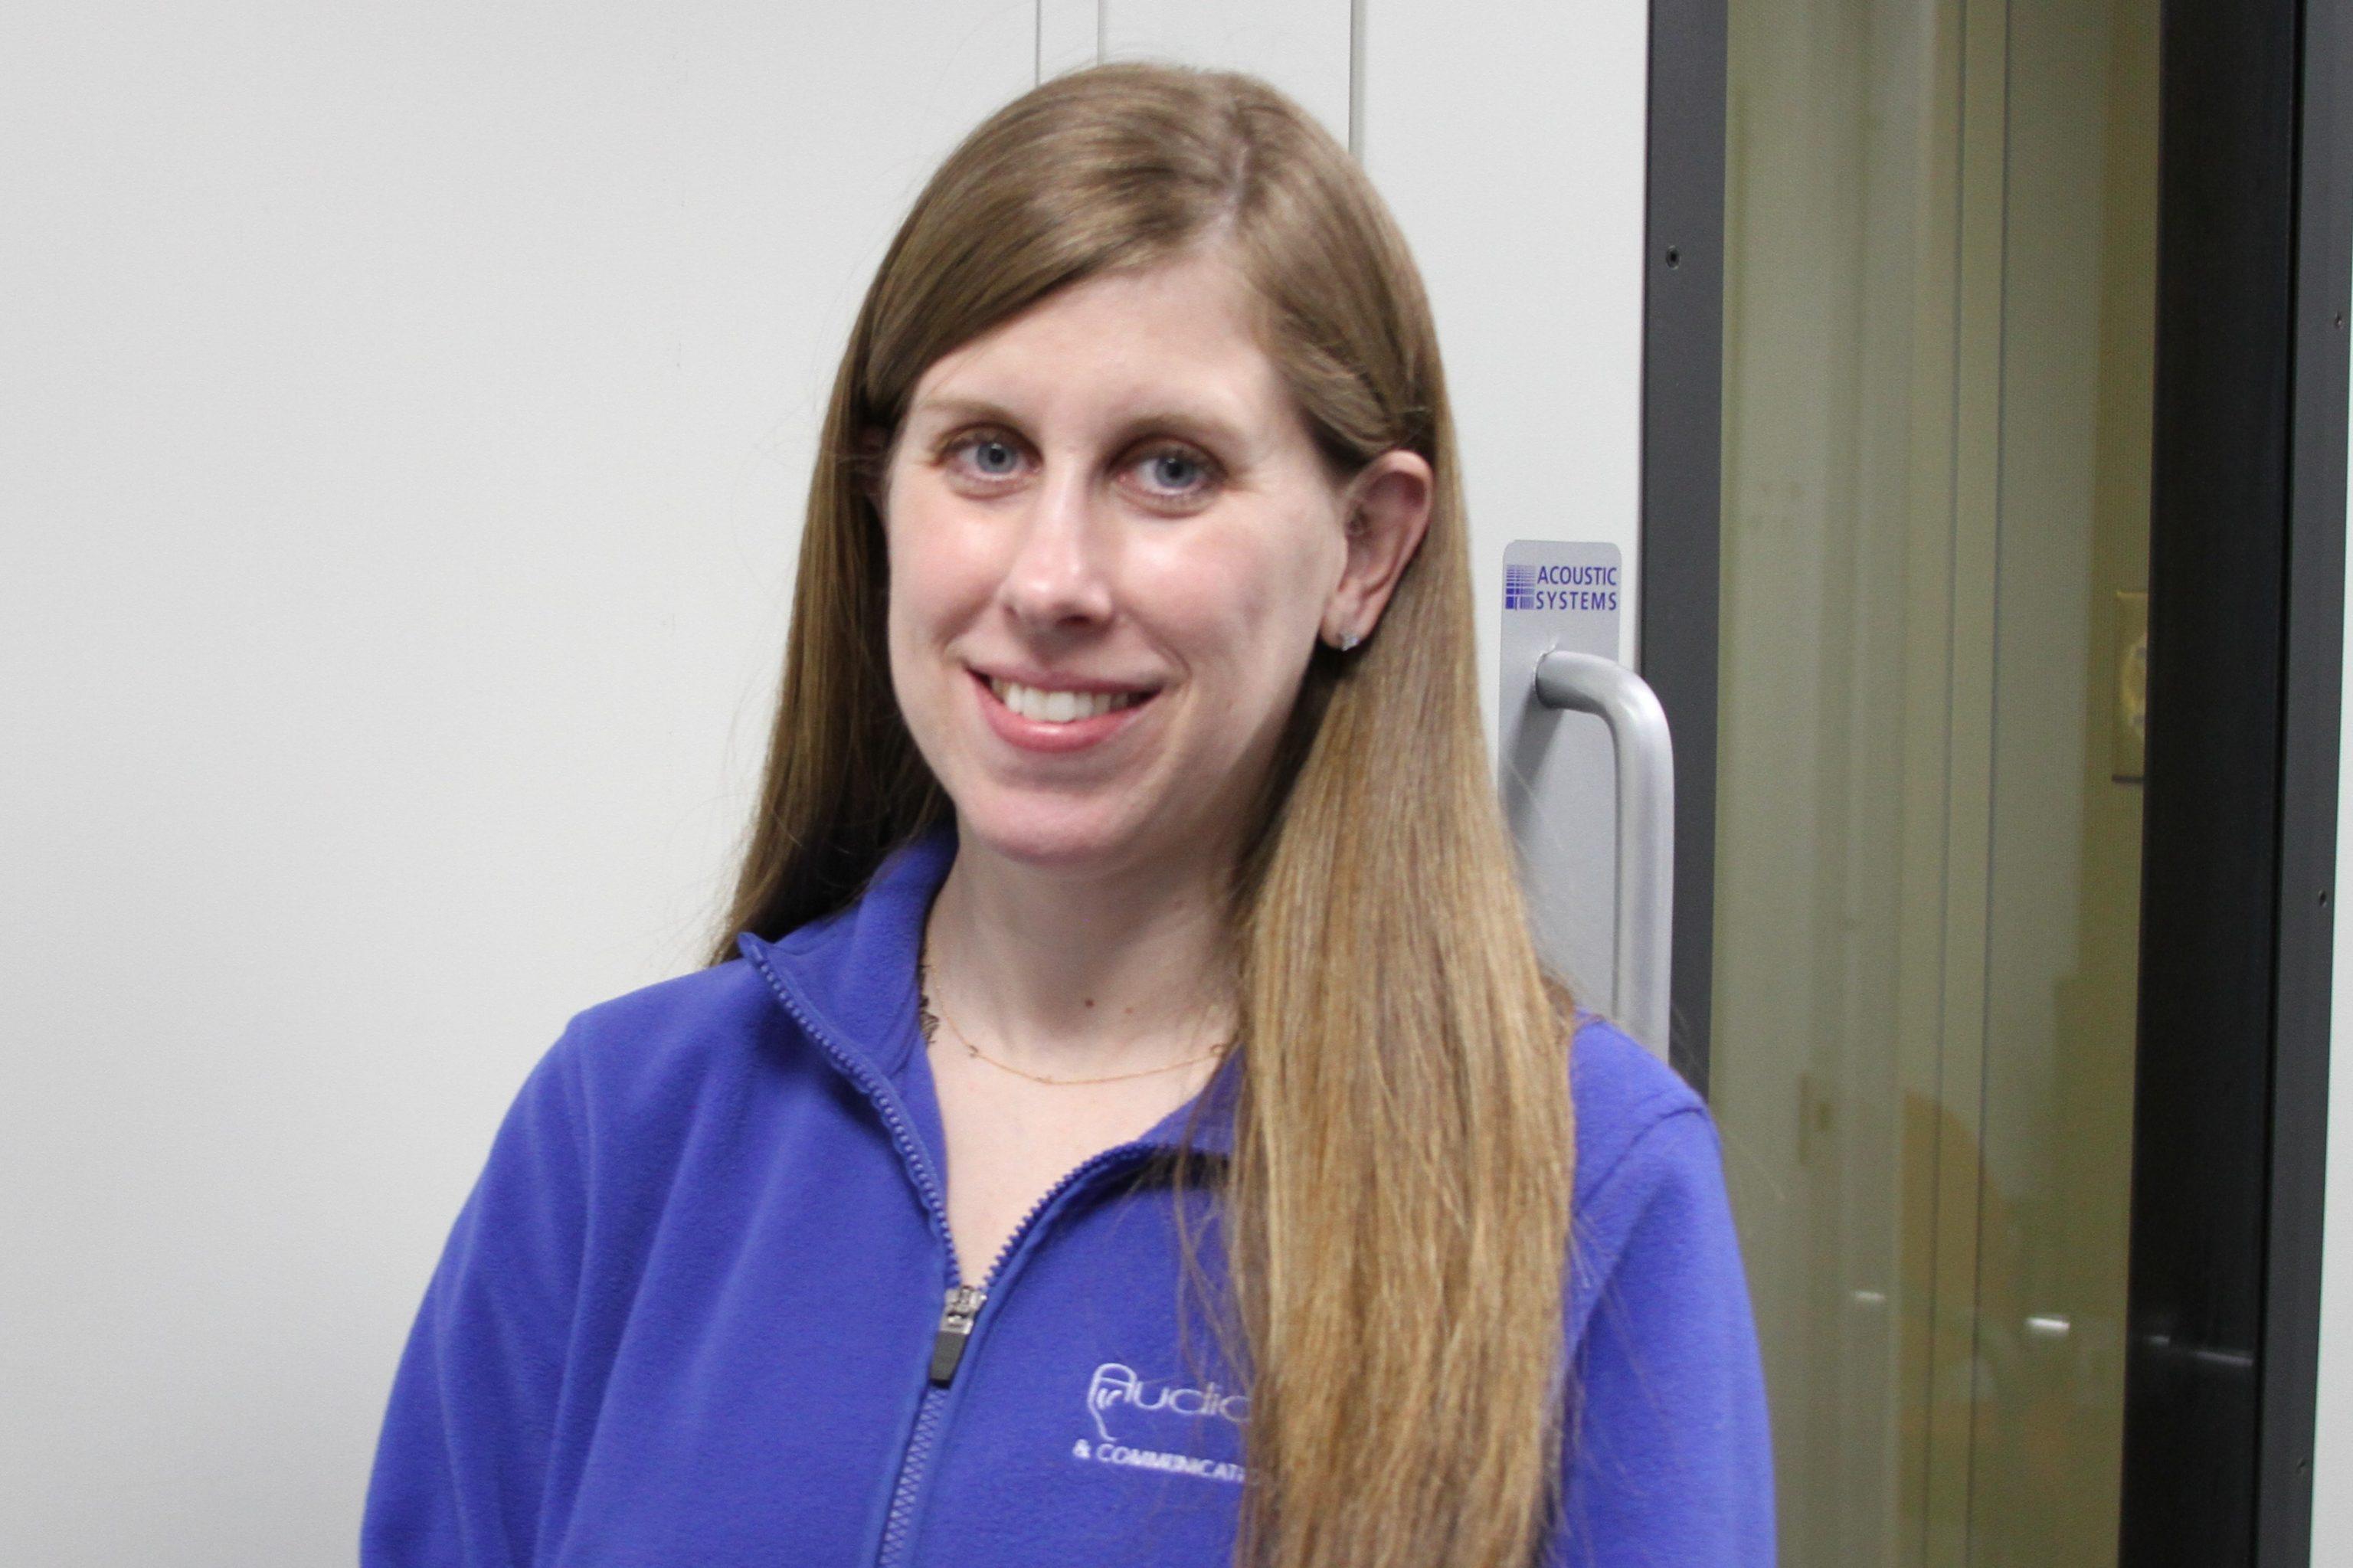 Elizabeth Ward Au.D. : Audiologist